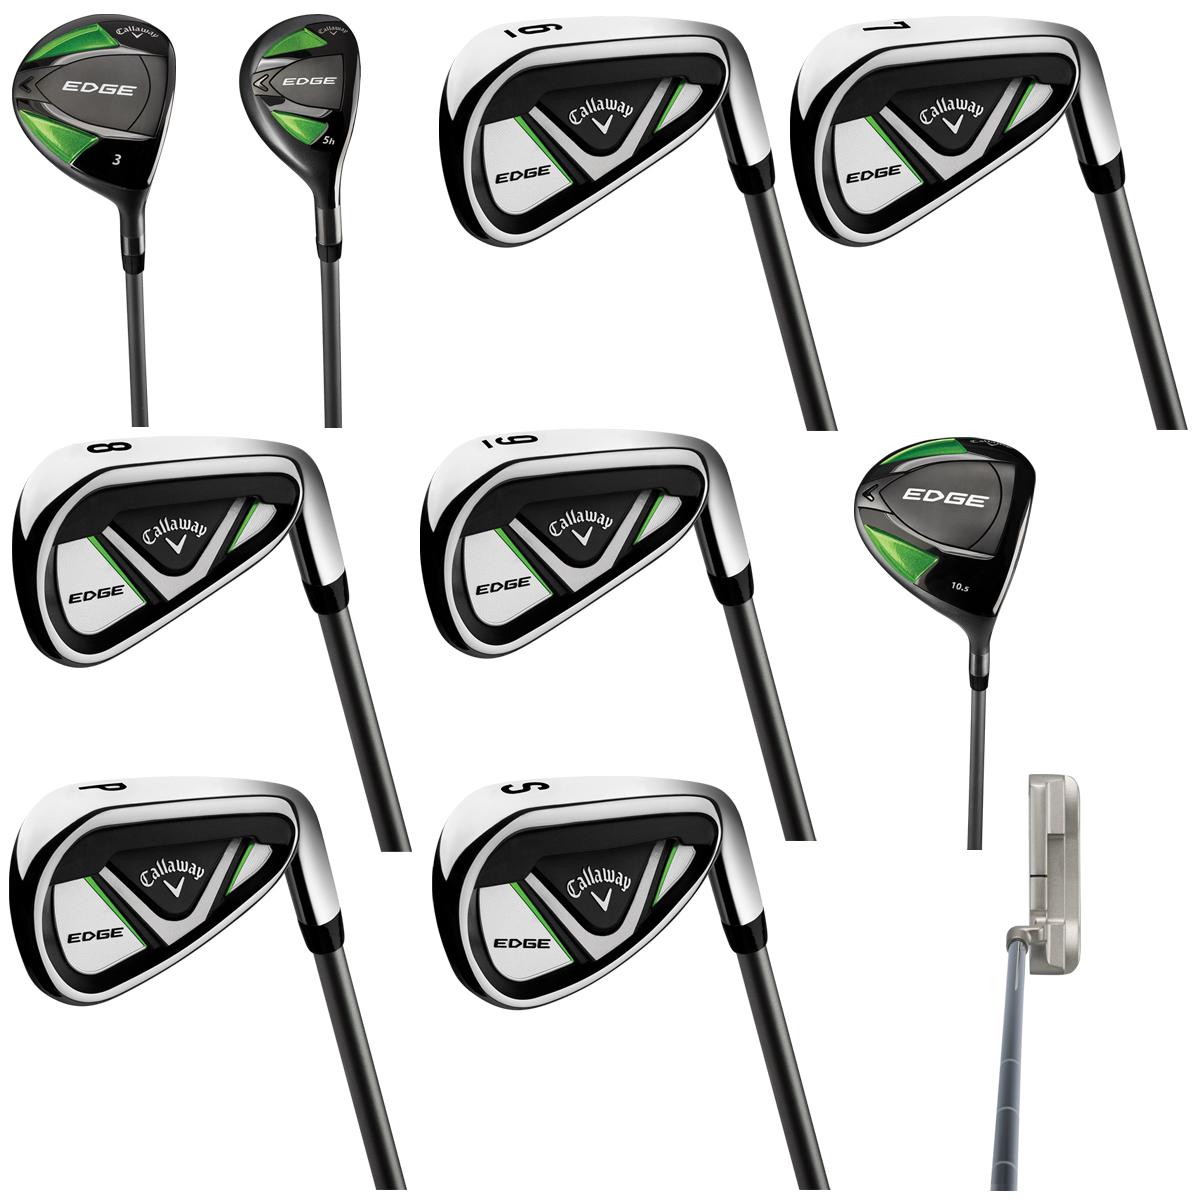 Callaway Edge Men S Right Hand Graphite Iron Shaft Golf Club 10pc Costco Australia